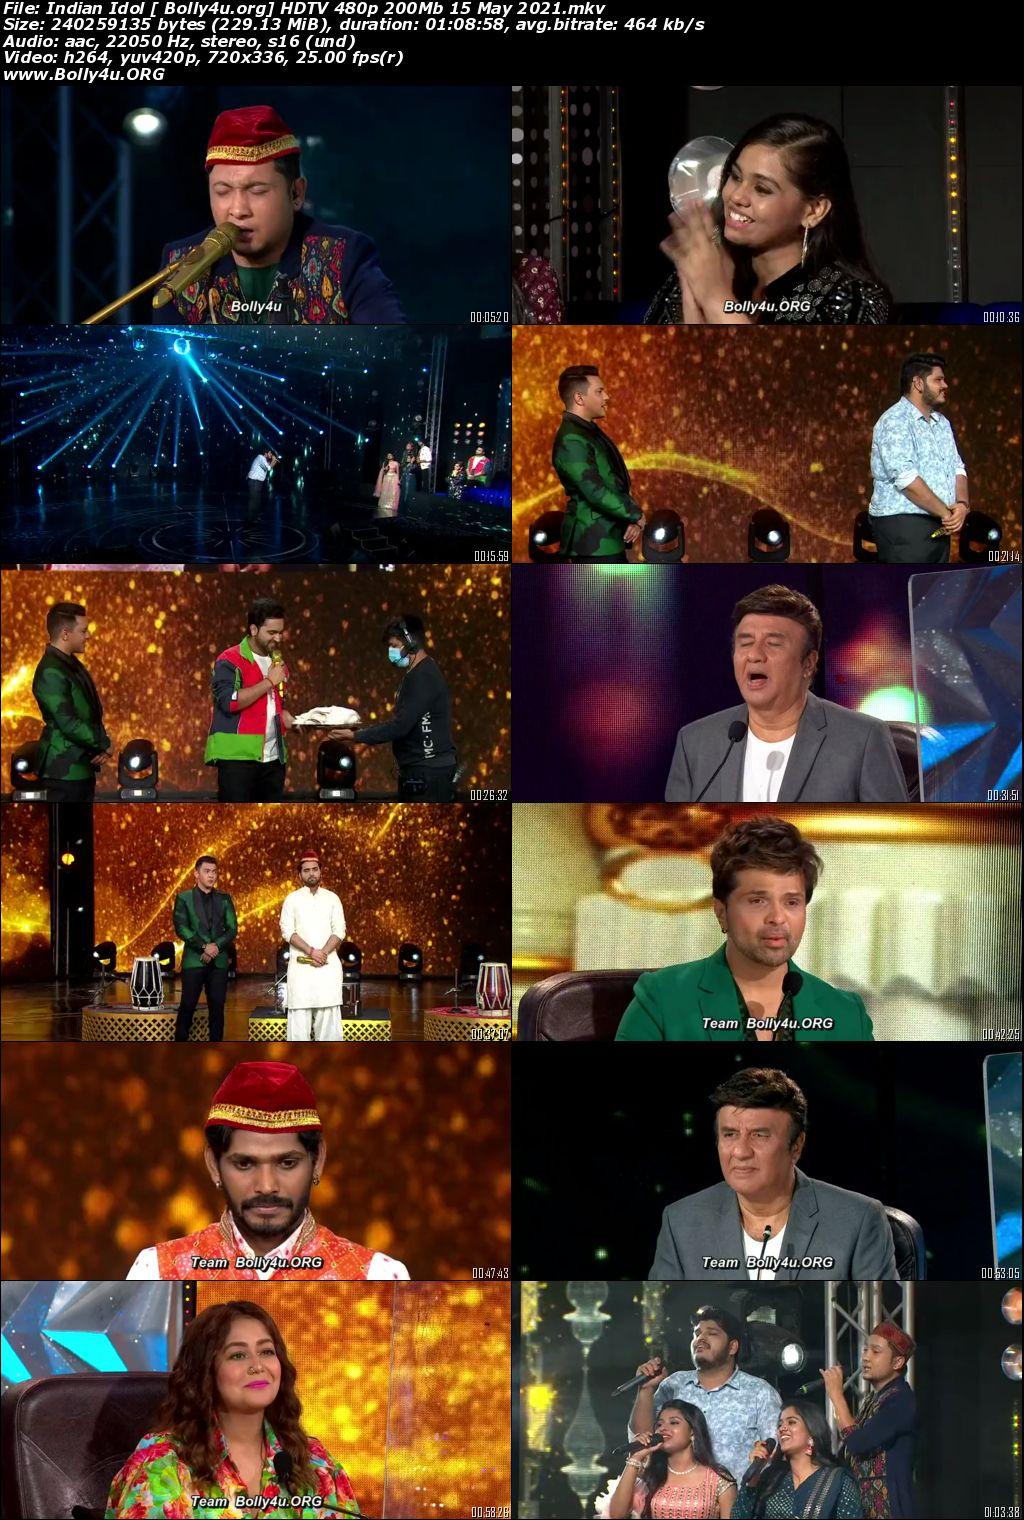 Indian Idol HDTV 480p 200Mb 15 May 2021 Download